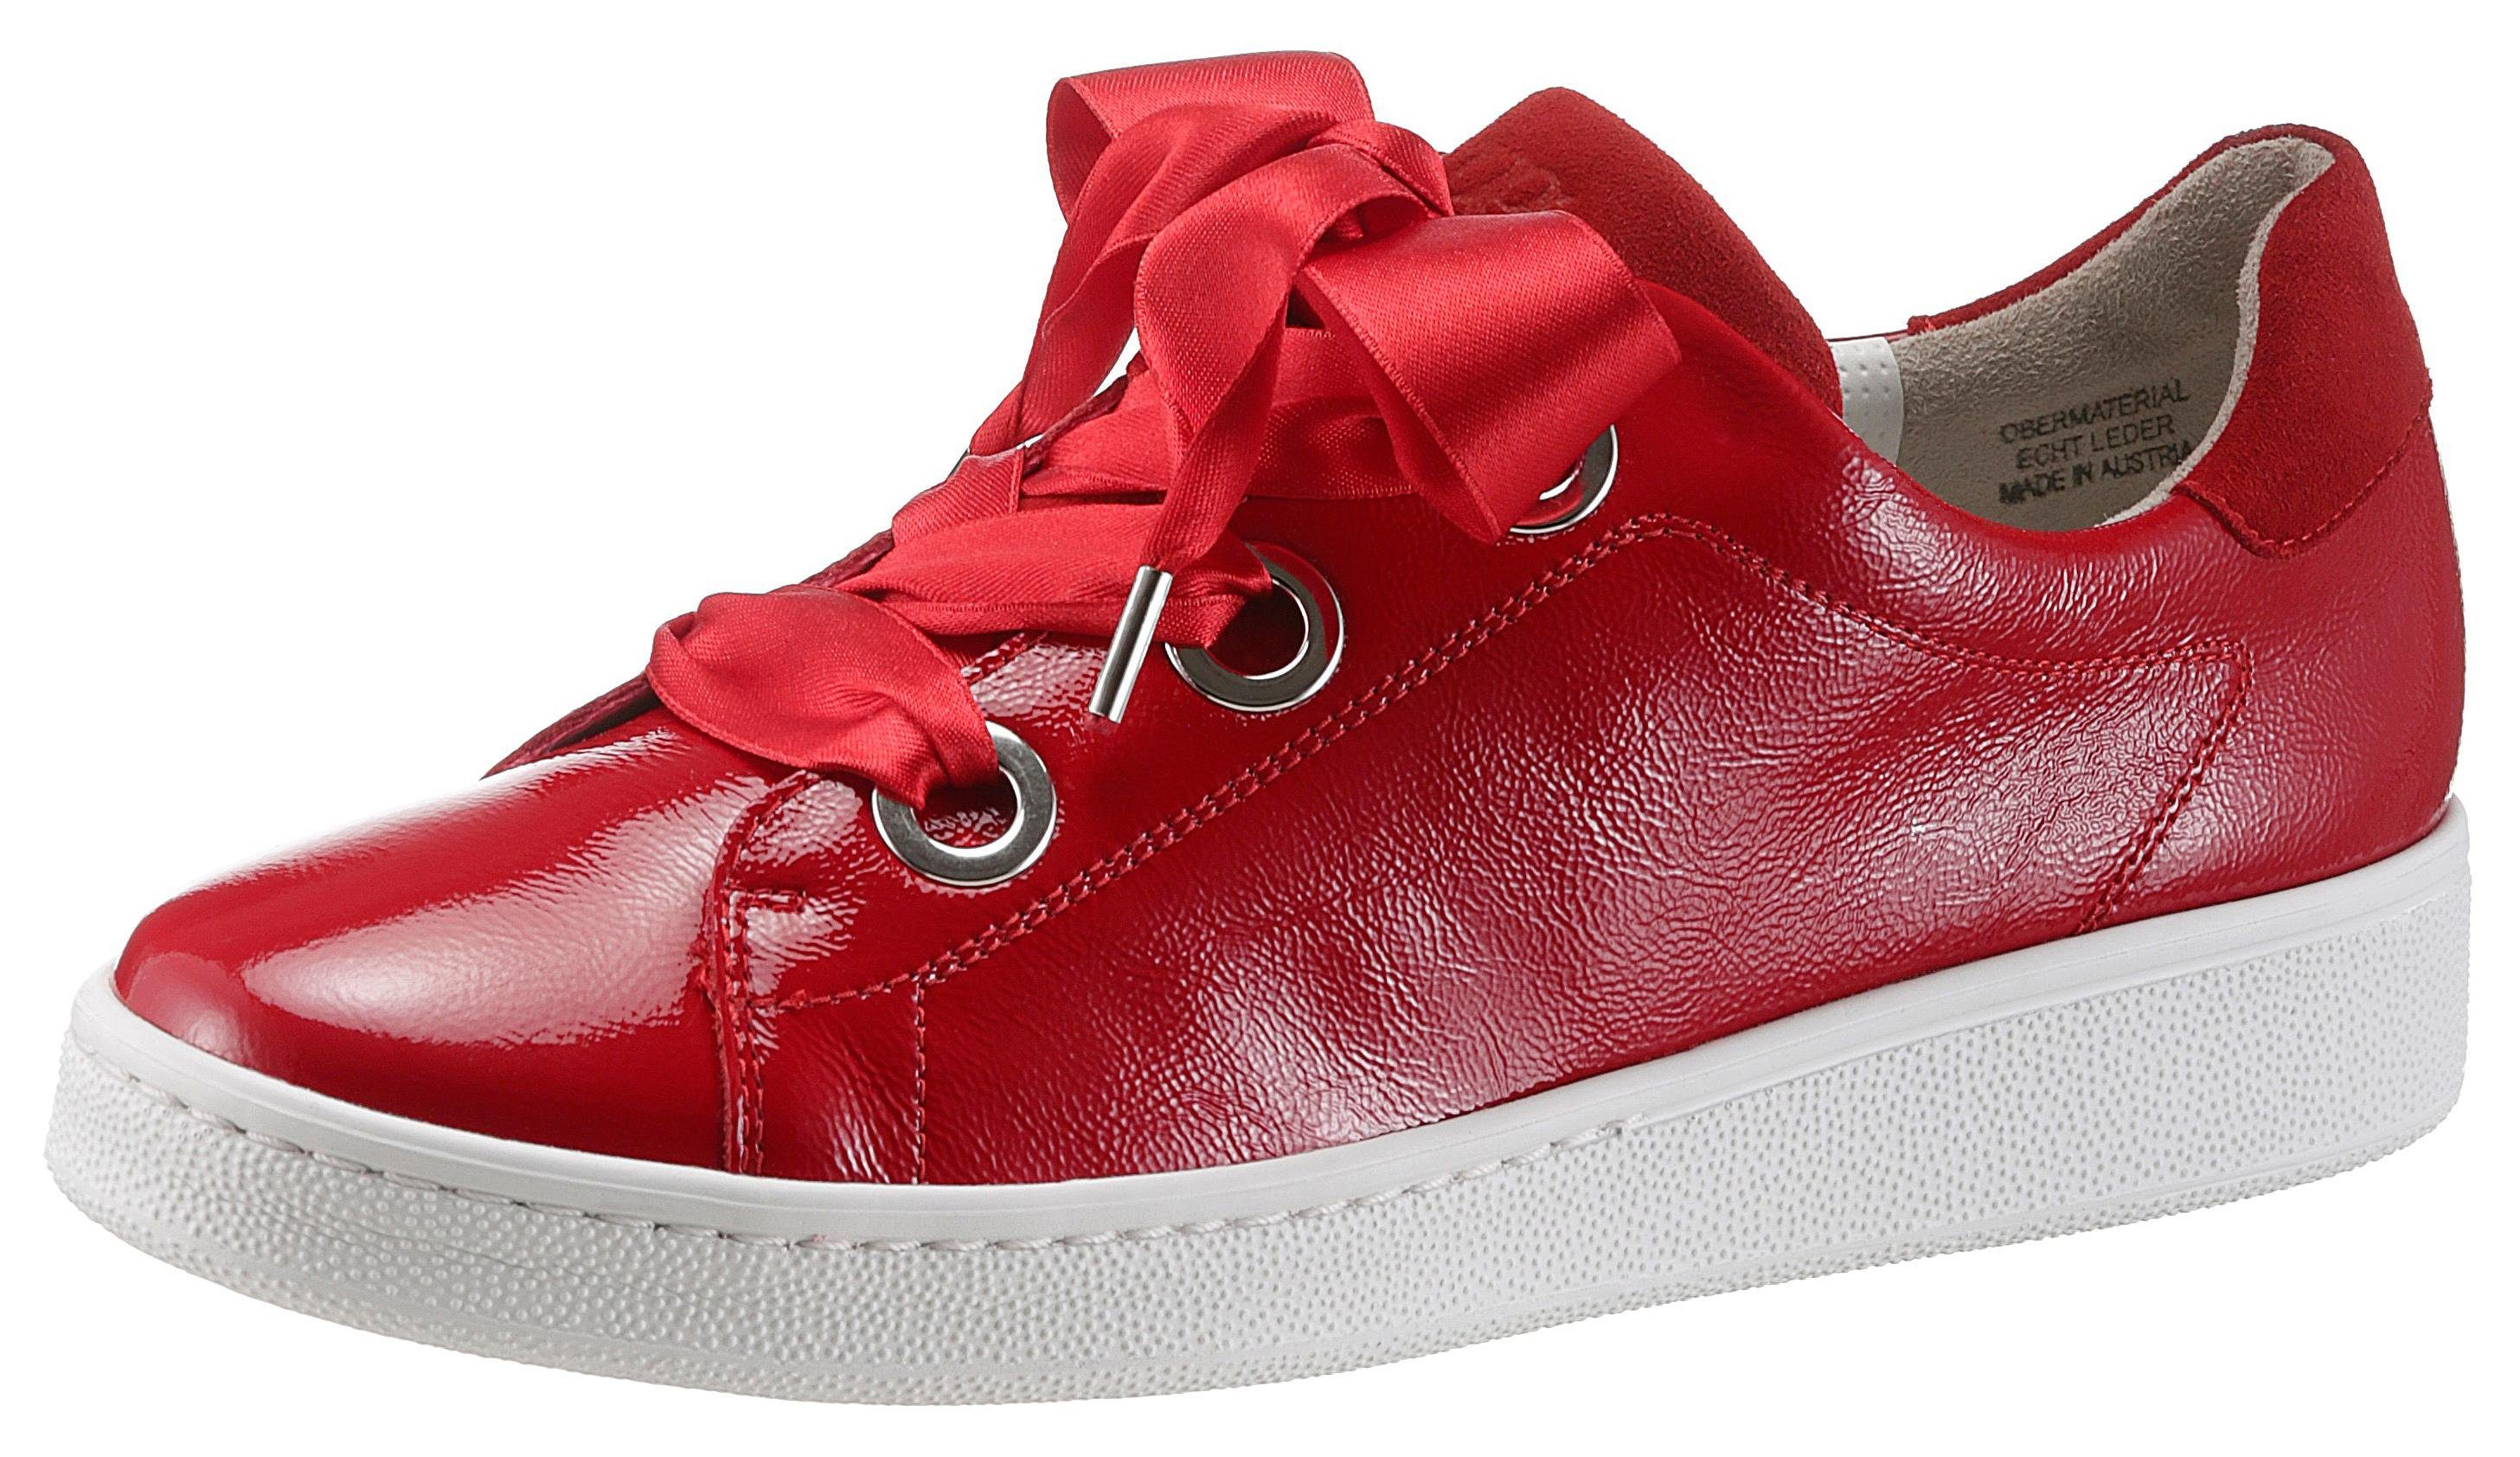 Paul Green Sneaker, mit auffälliger Schnürung, rot, rot